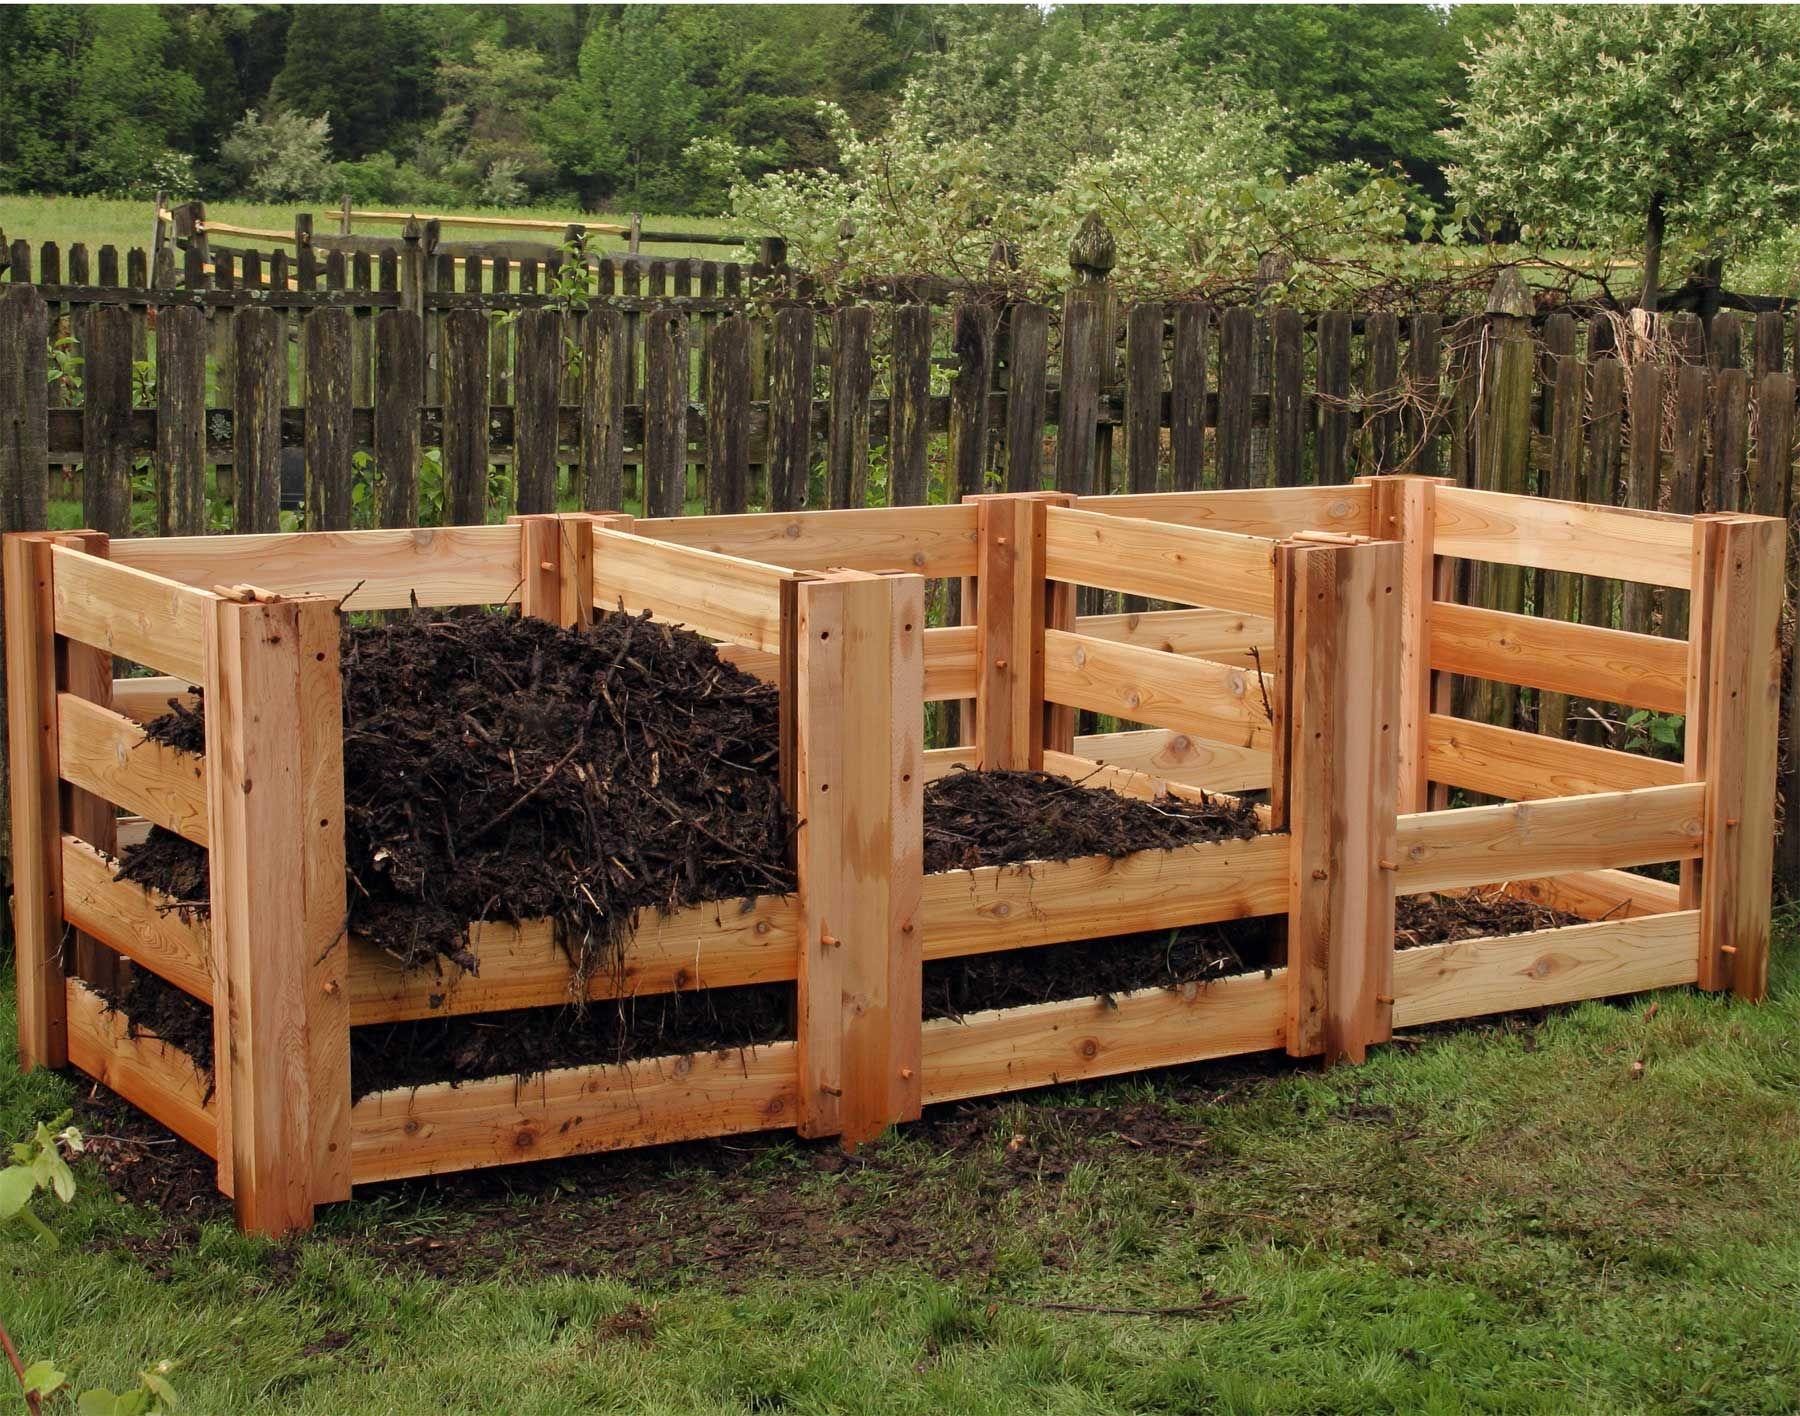 22 best Compost Bins images on Pinterest | Compost, Diy compost bin ...